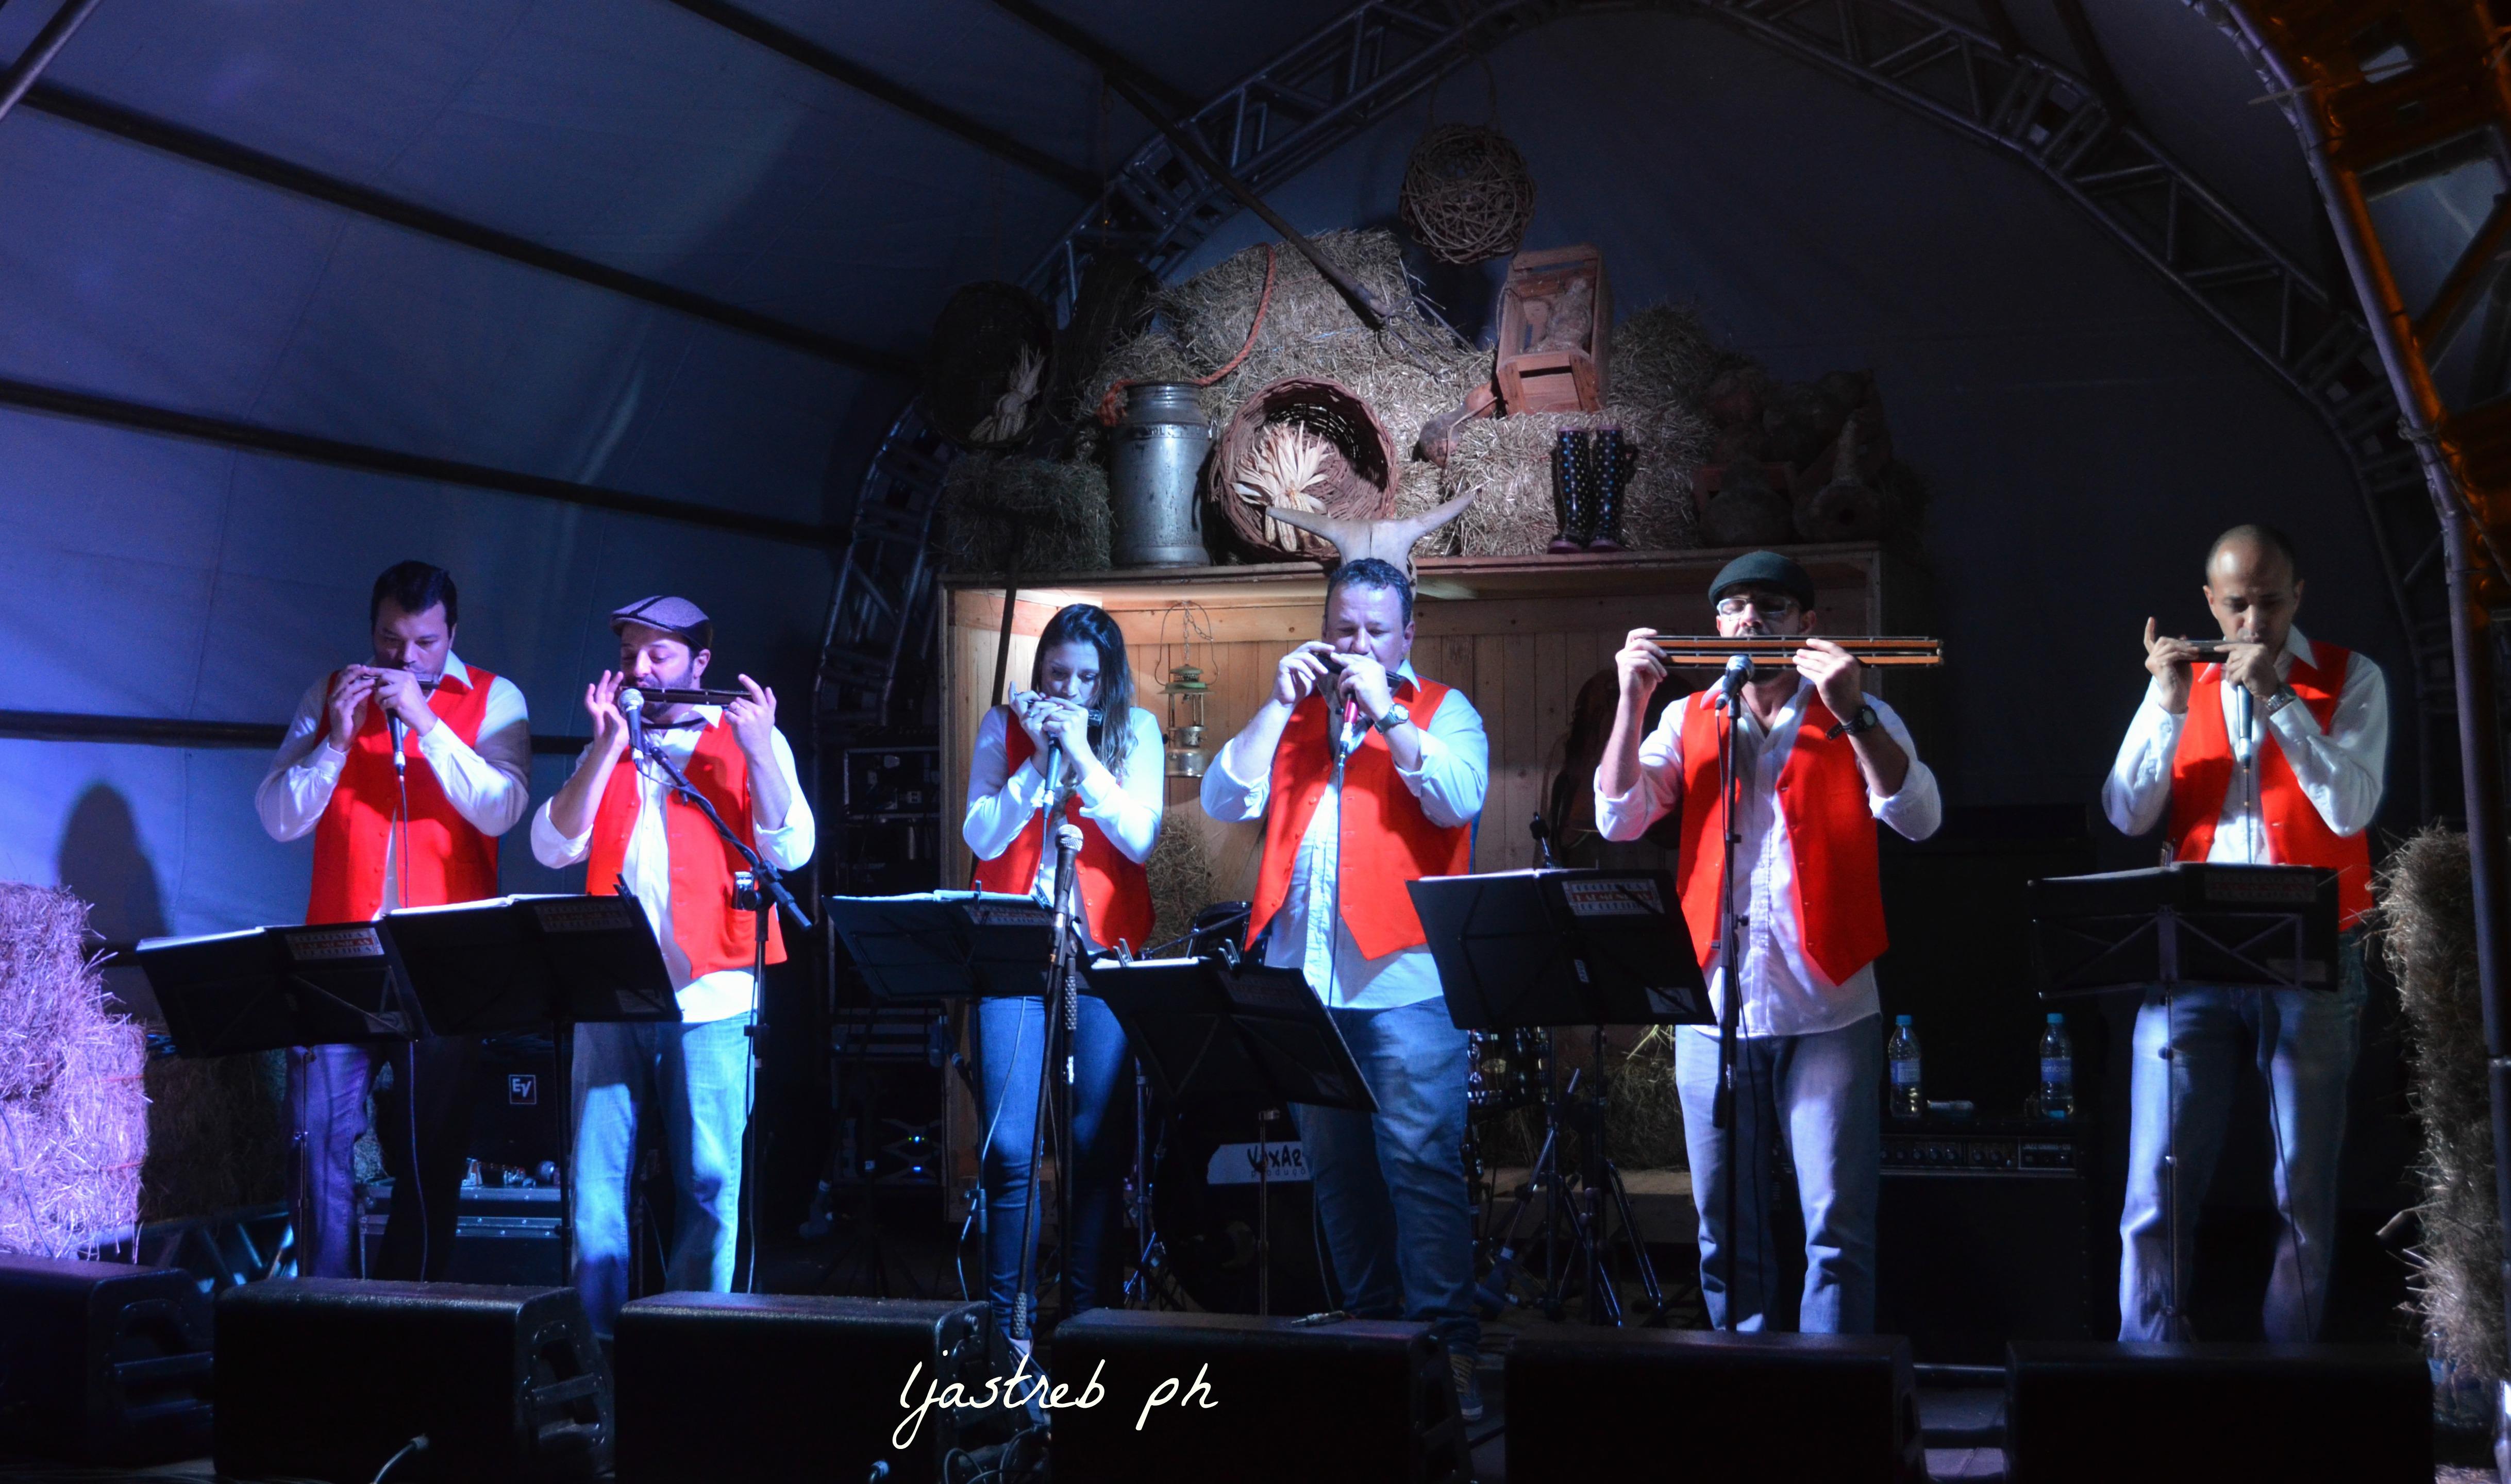 Orquesta de armonicas de Curitiba